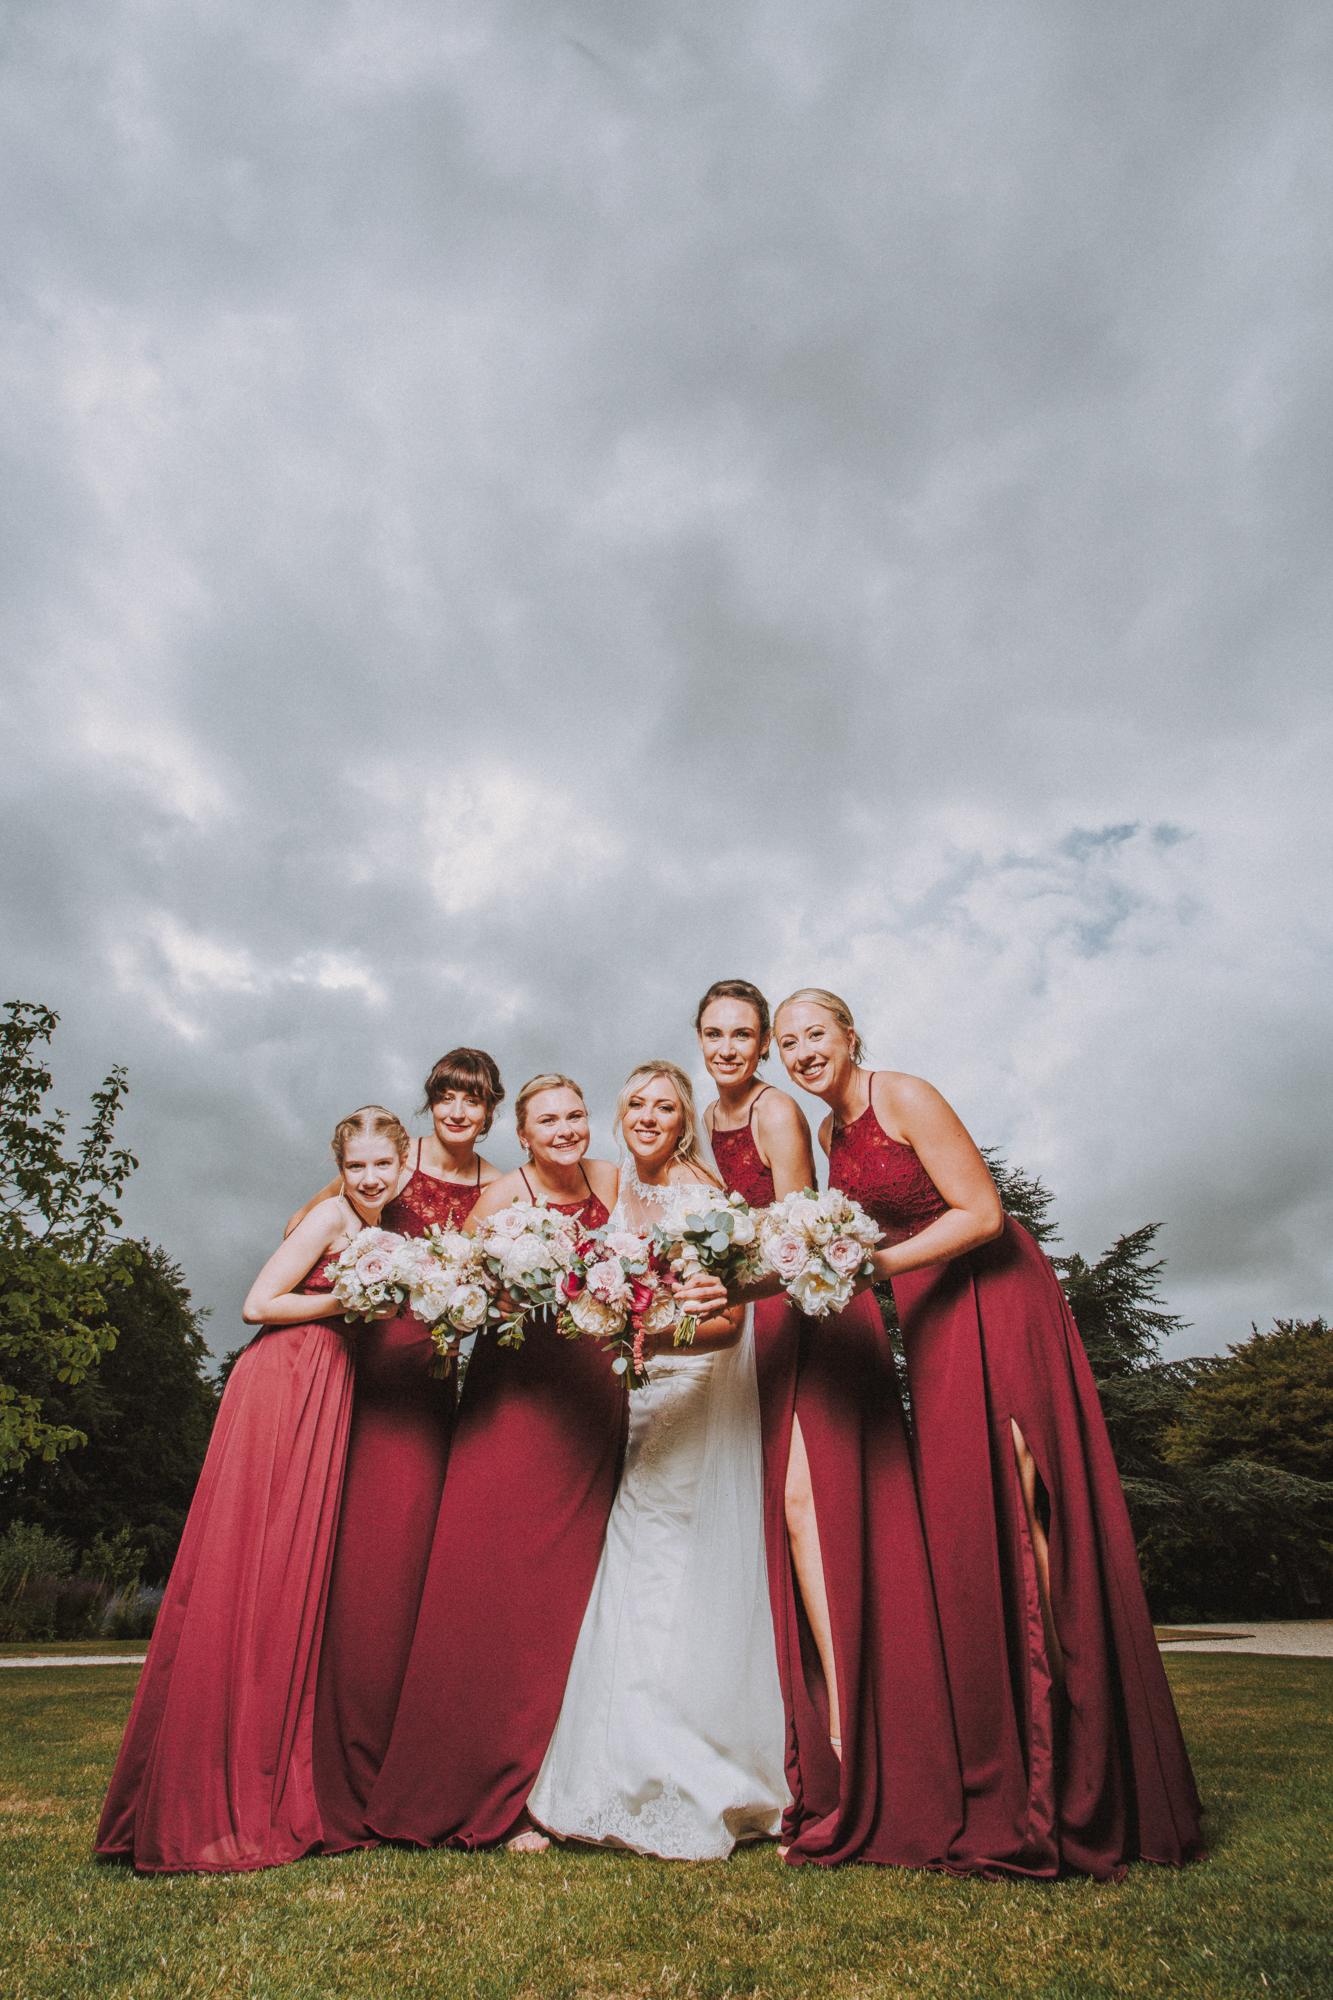 bowcliffe hall wedding photographers yorkshire-54.jpg